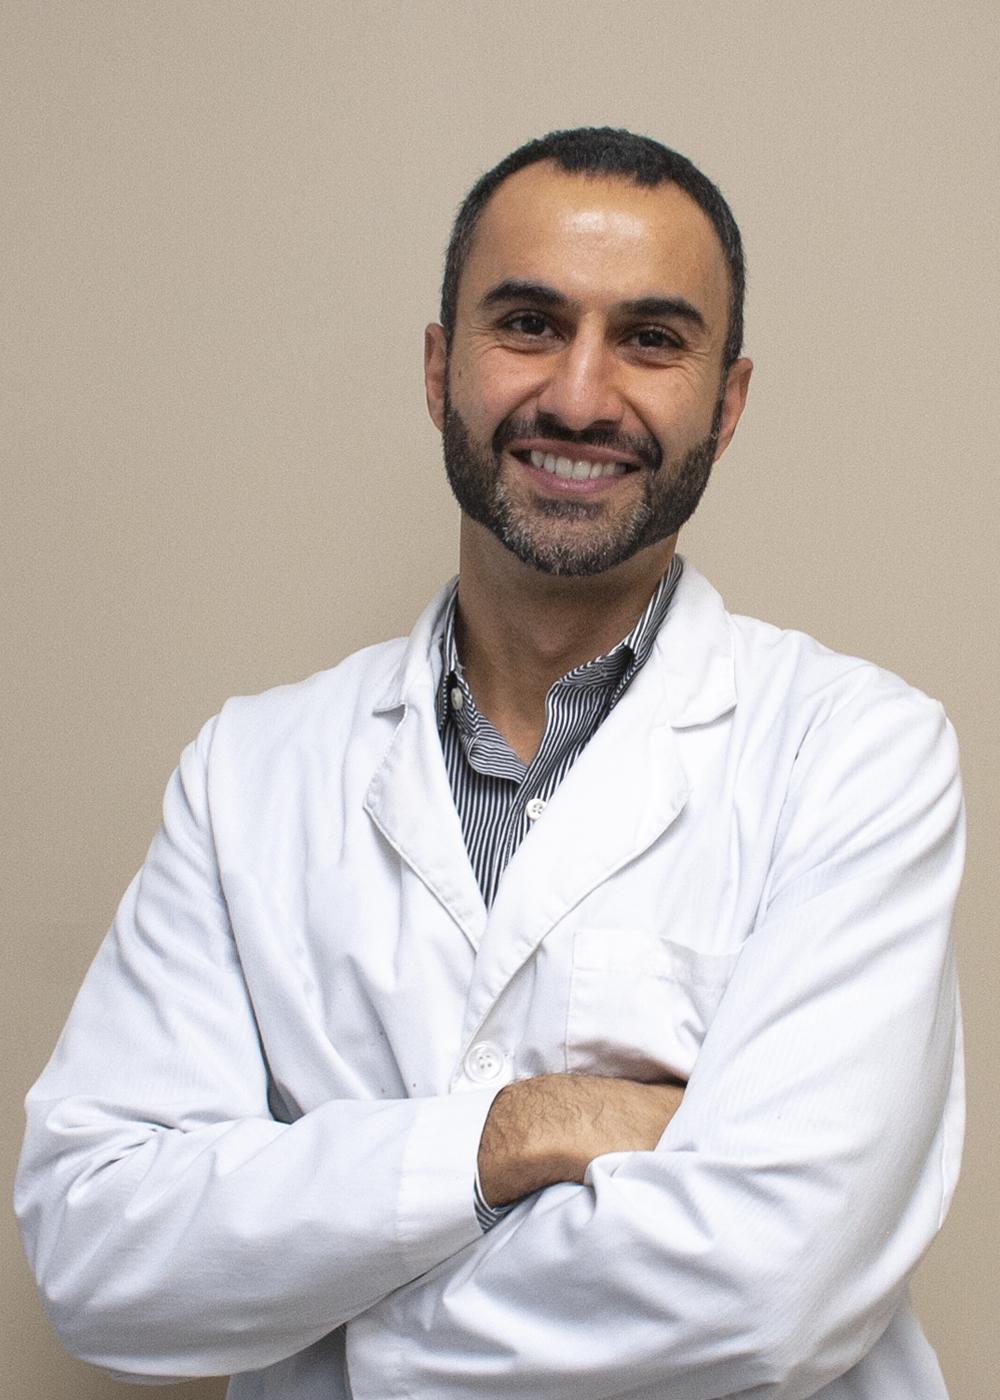 Dr. Hossein Aram